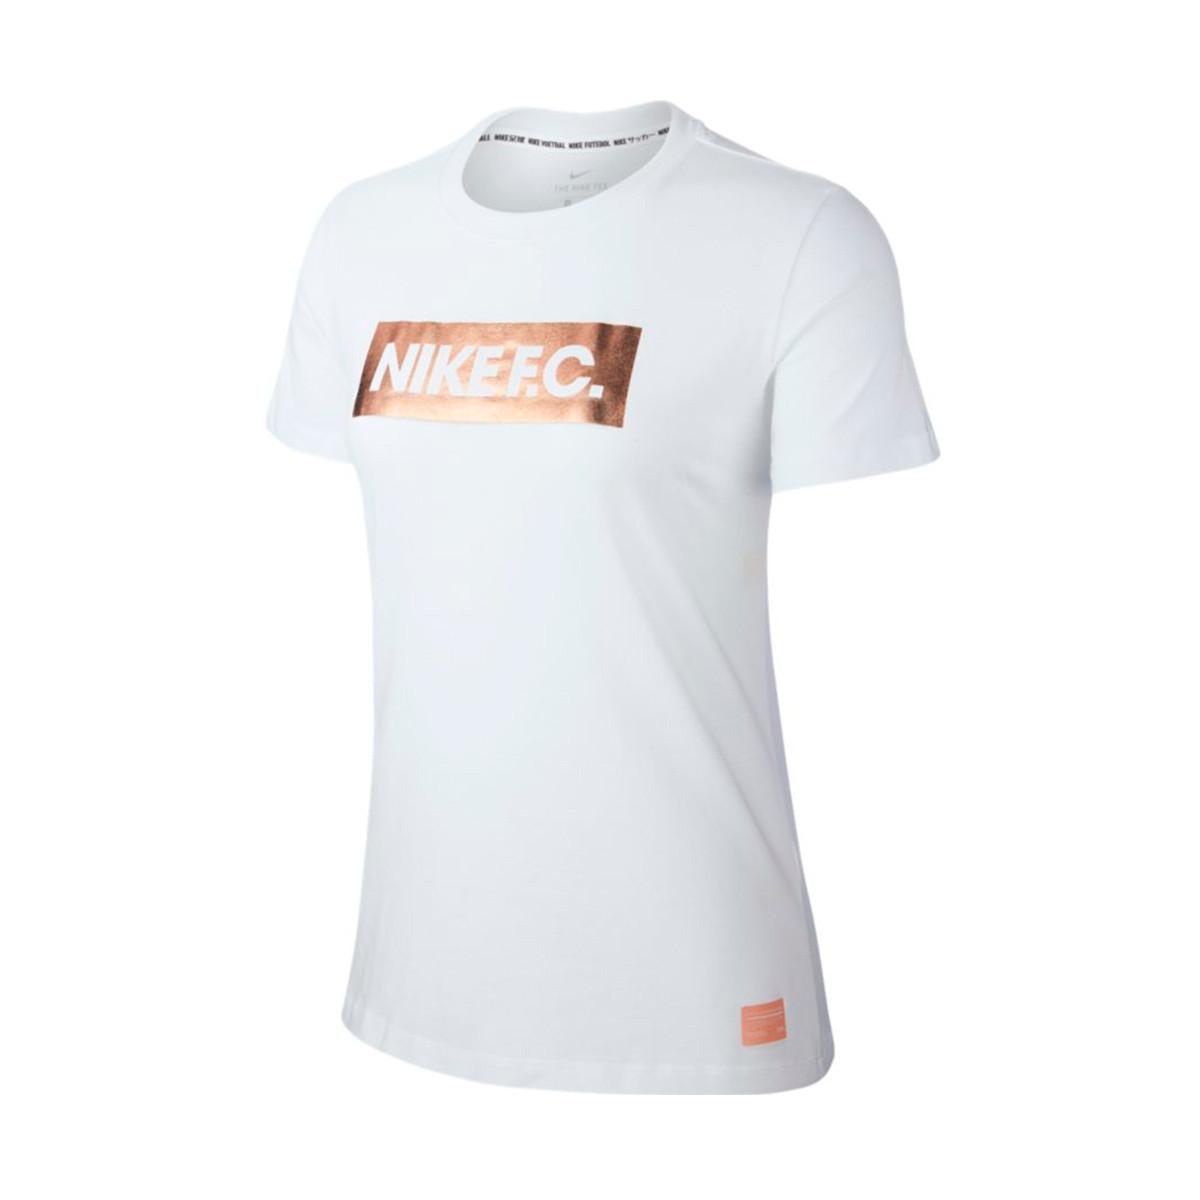 5f119d1be Camiseta Nike Nike F.C. Block Mujer White - Tienda de fútbol Fútbol Emotion